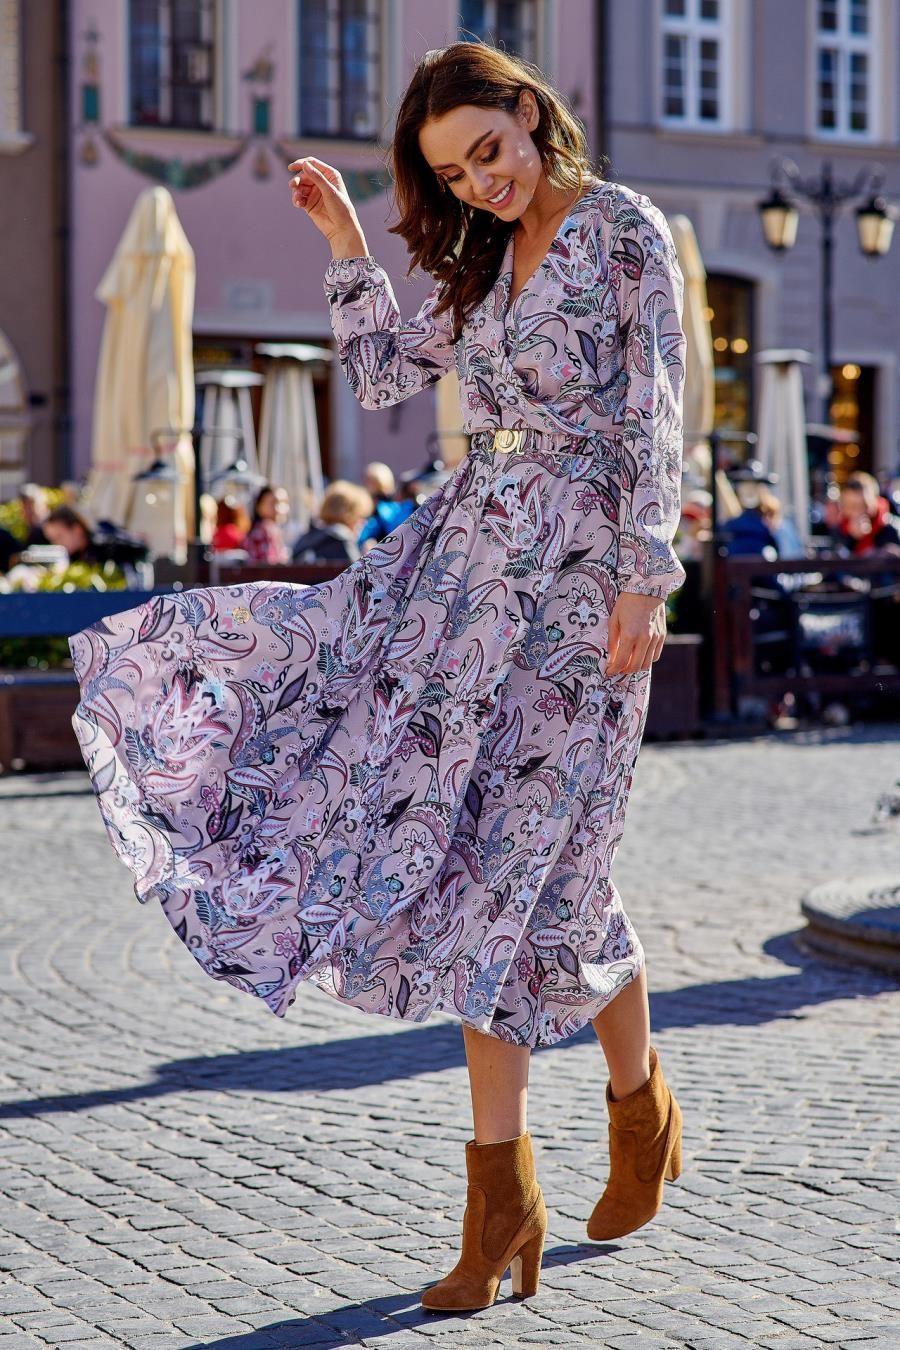 Midi Sukienka Z Kopertowym Dekoltem Boho Lel286 Midi Dress Dresses Beautiful Dresses